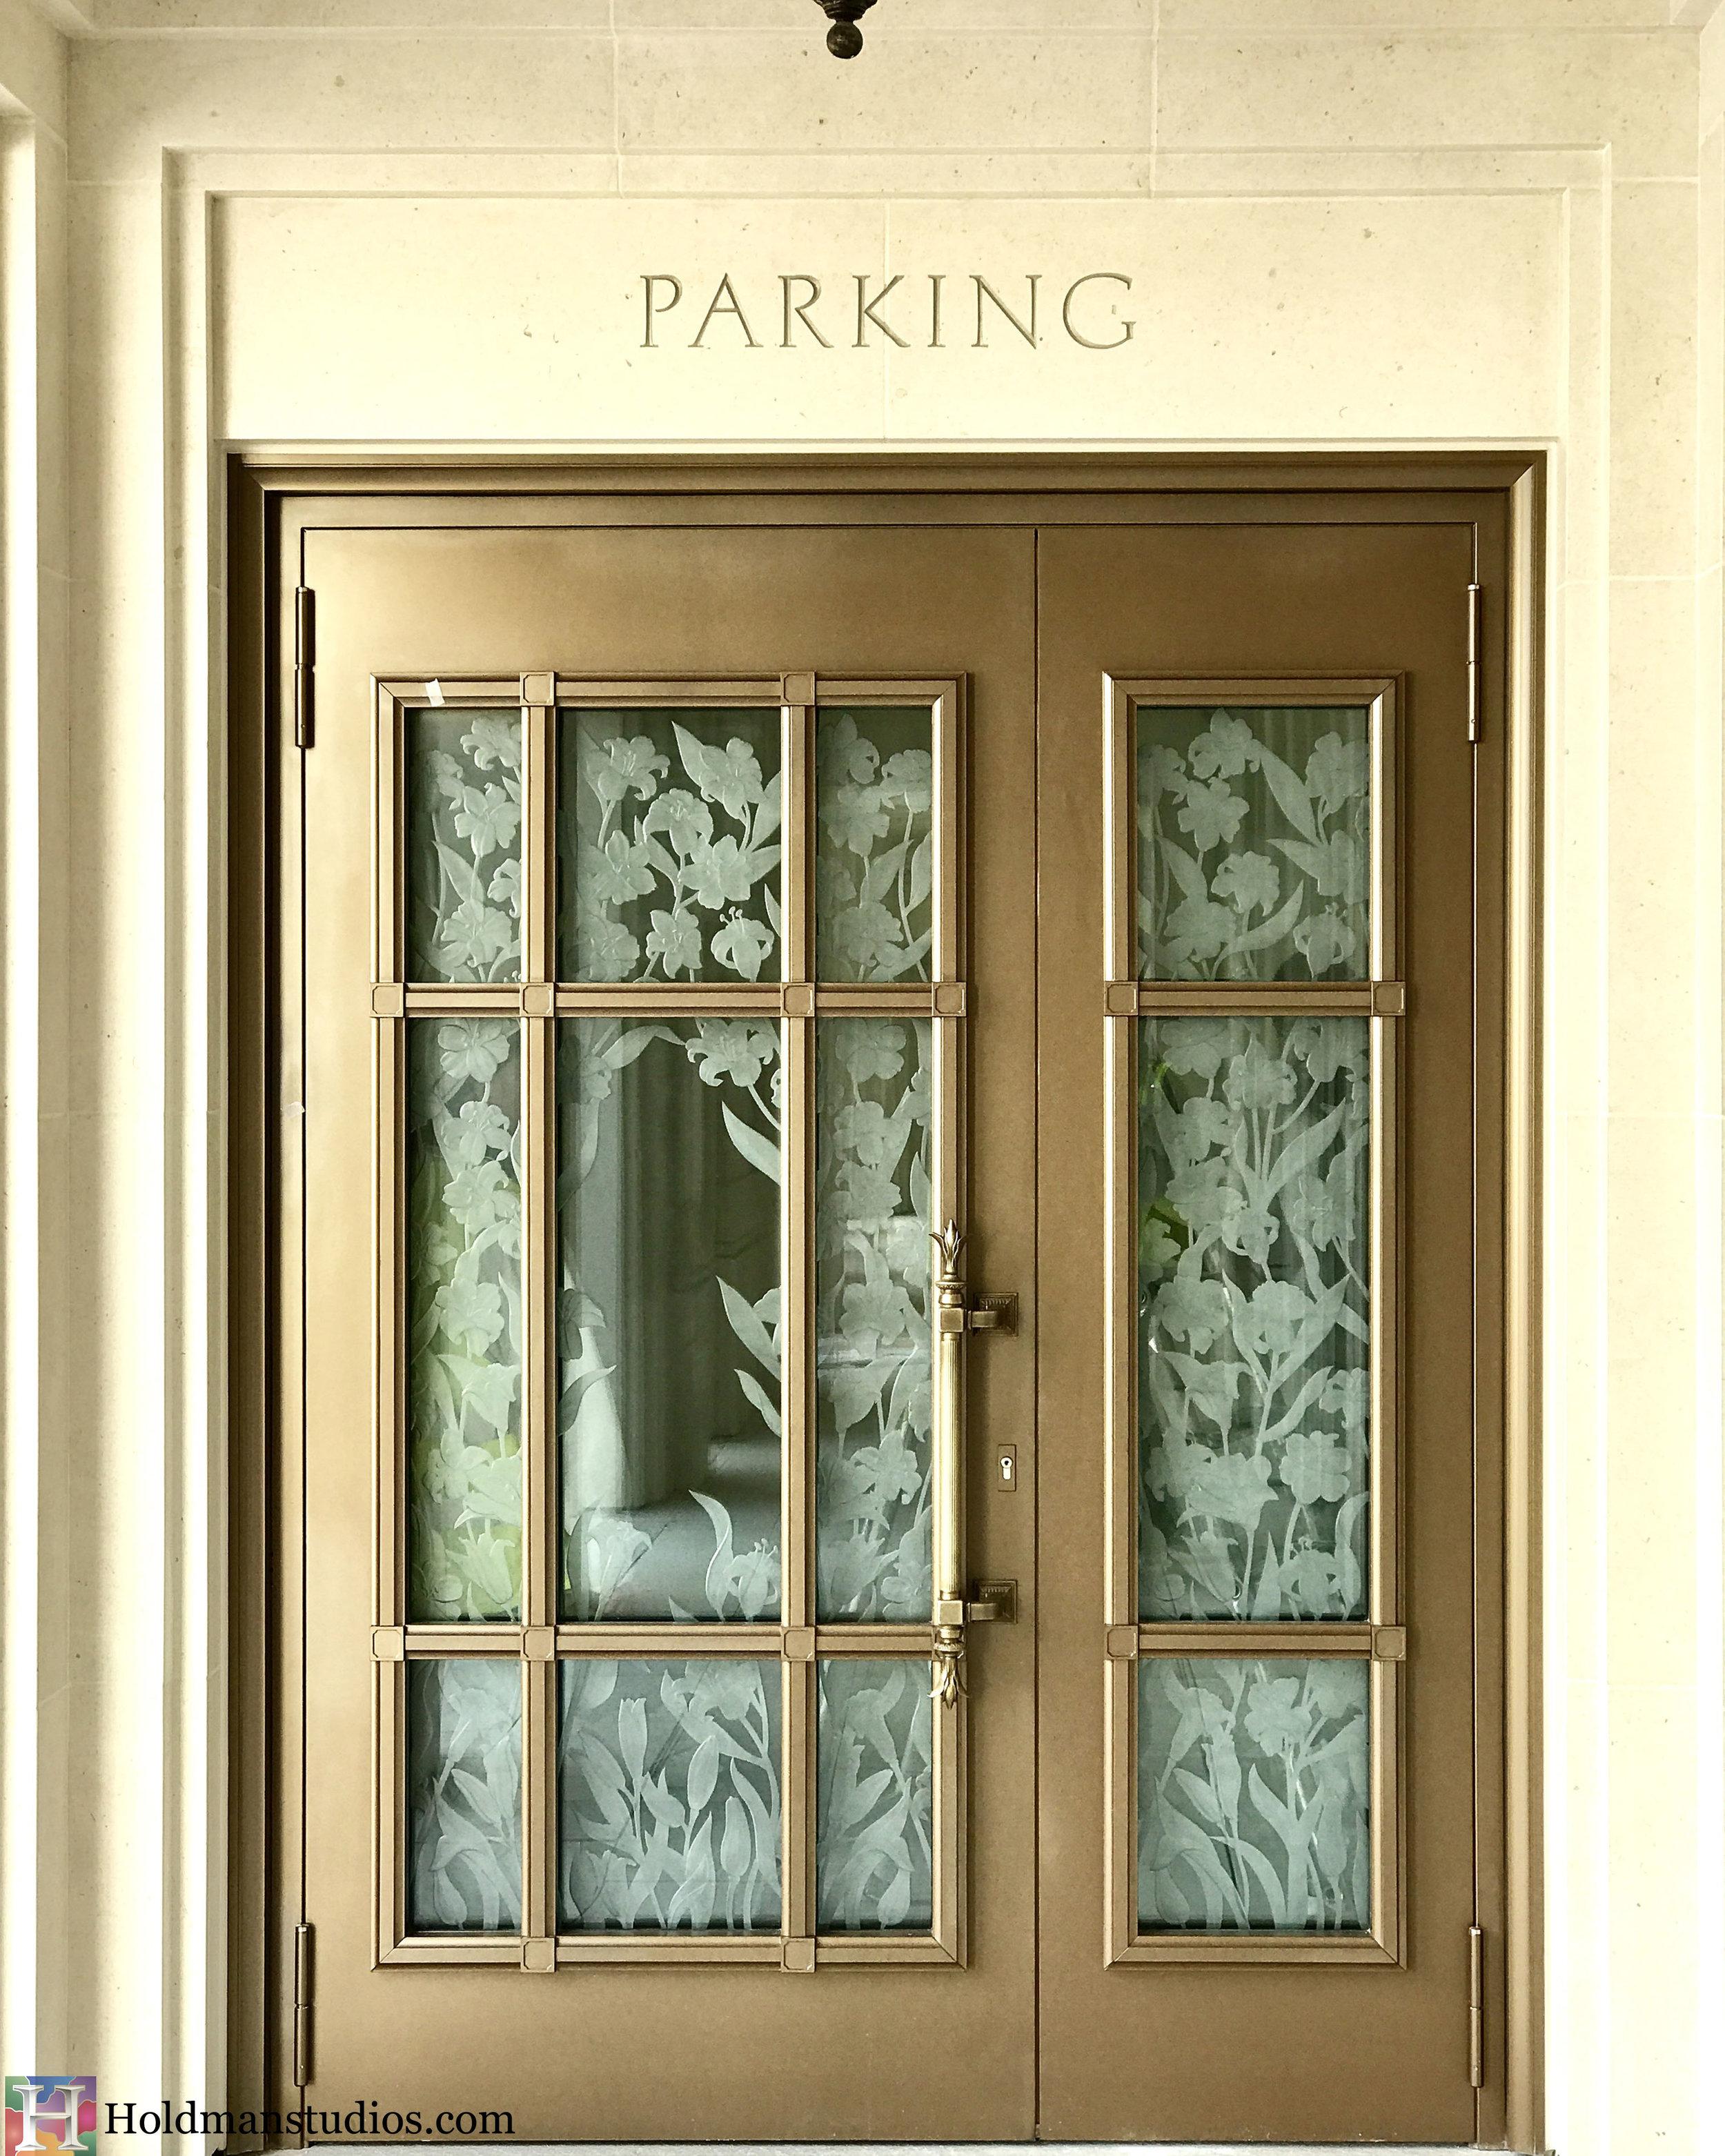 Holdman-Studios-Etched-Glass-Paris-LDS-Temple-Lily-Flowers-Exterior-Parking-Door-Windows.jpg